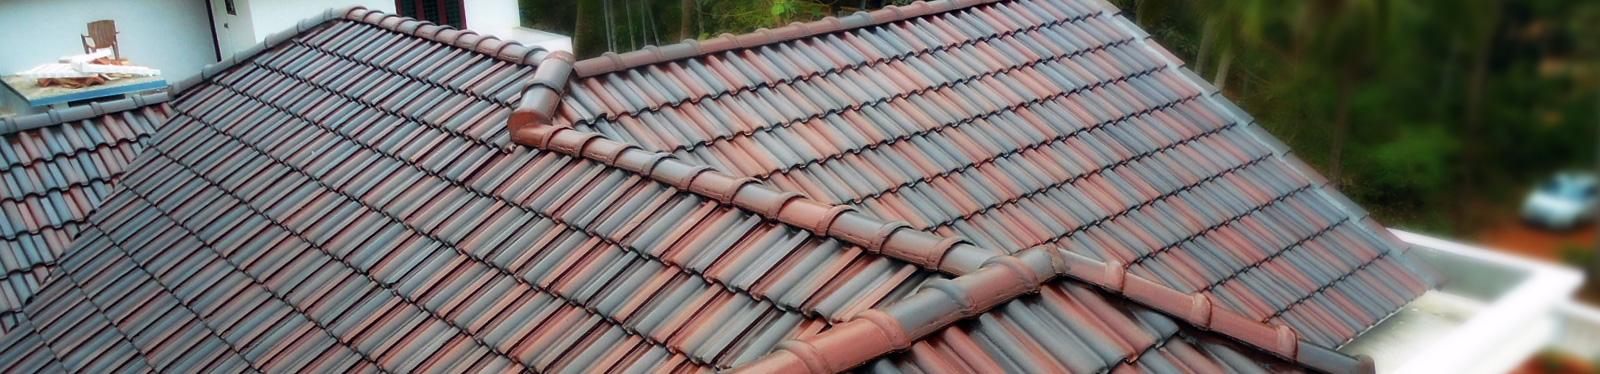 PIONNIER Roofing Solutions » Endurer